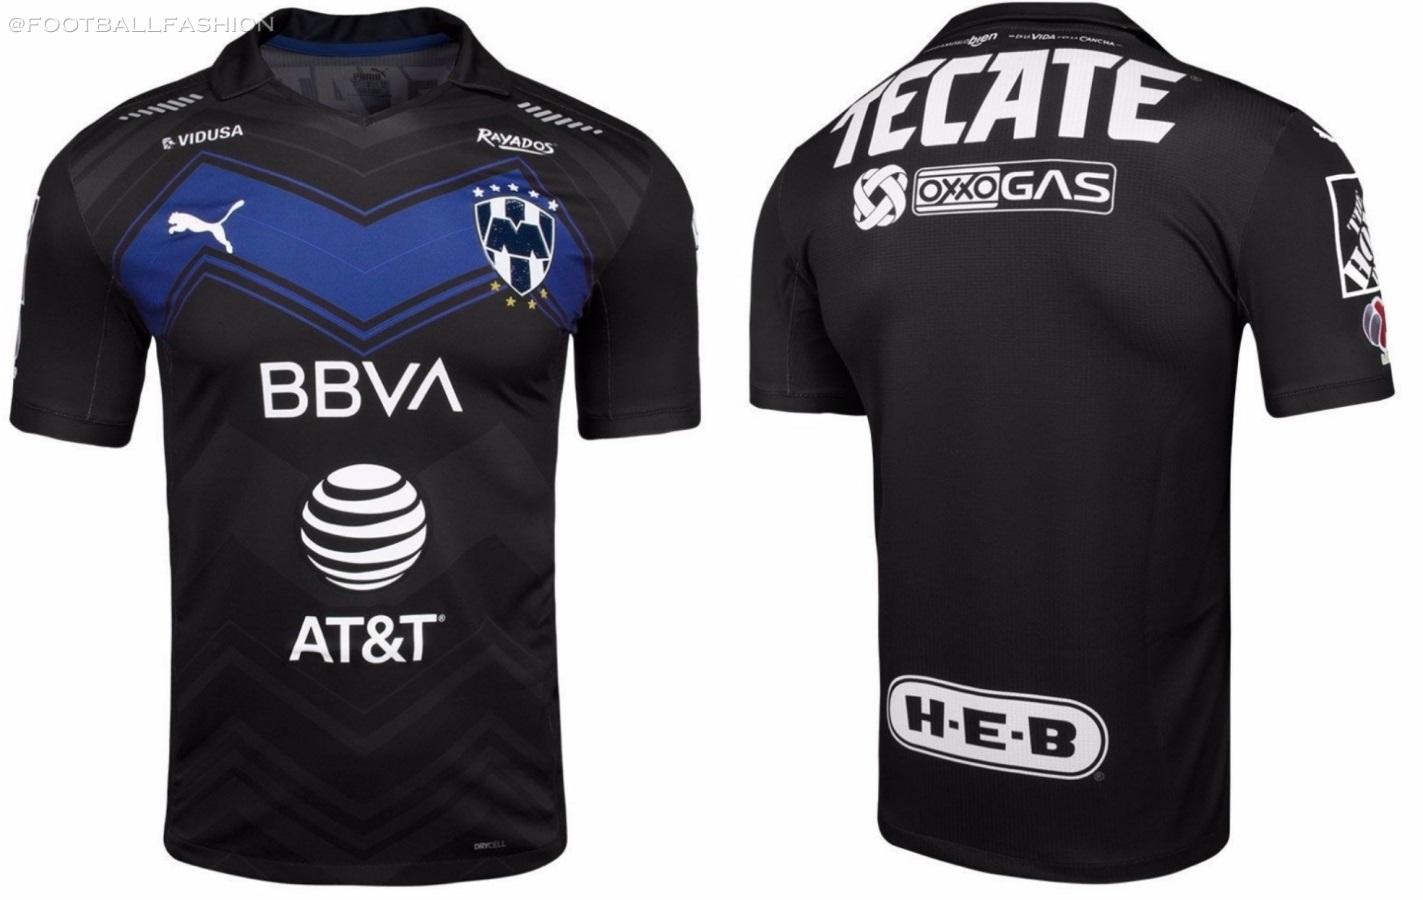 Rayados de Monterrey Black 2021 PUMA Third Soccer Jersey, Shirt, Football Kit, Camiseta de Futbol Tercera